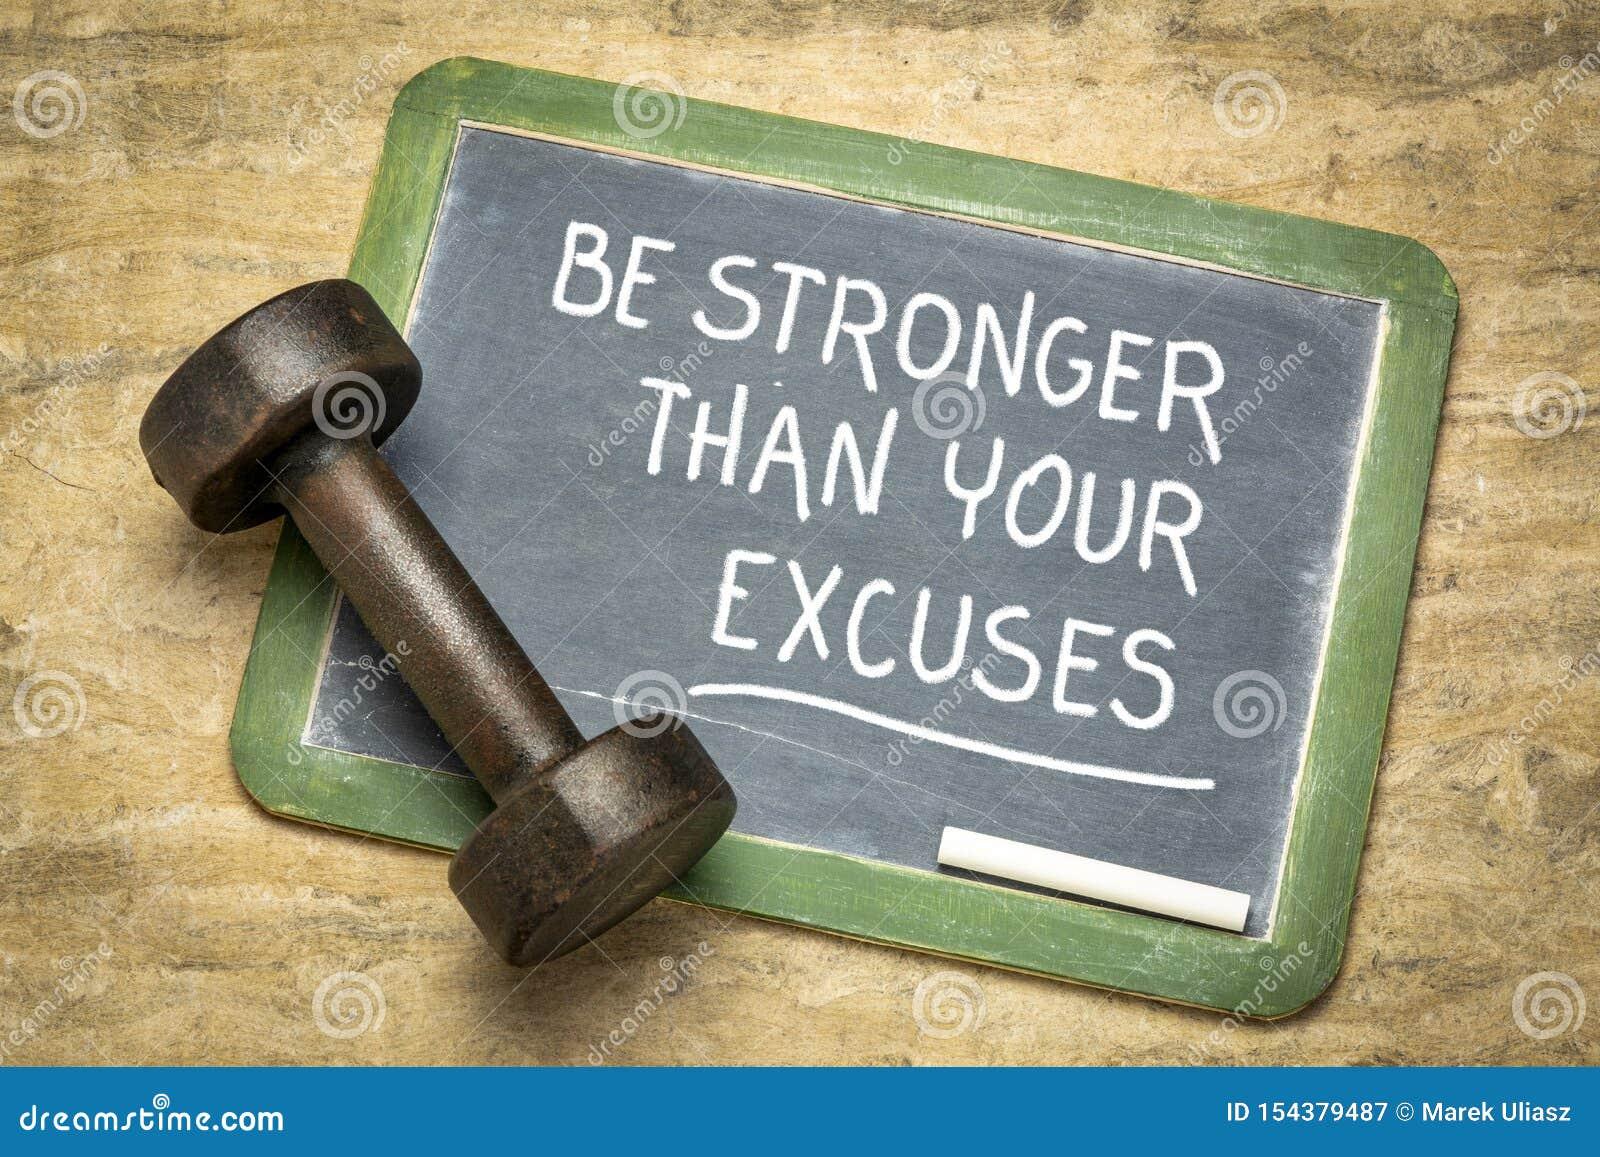 Sea m?s fuertes que sus excusas